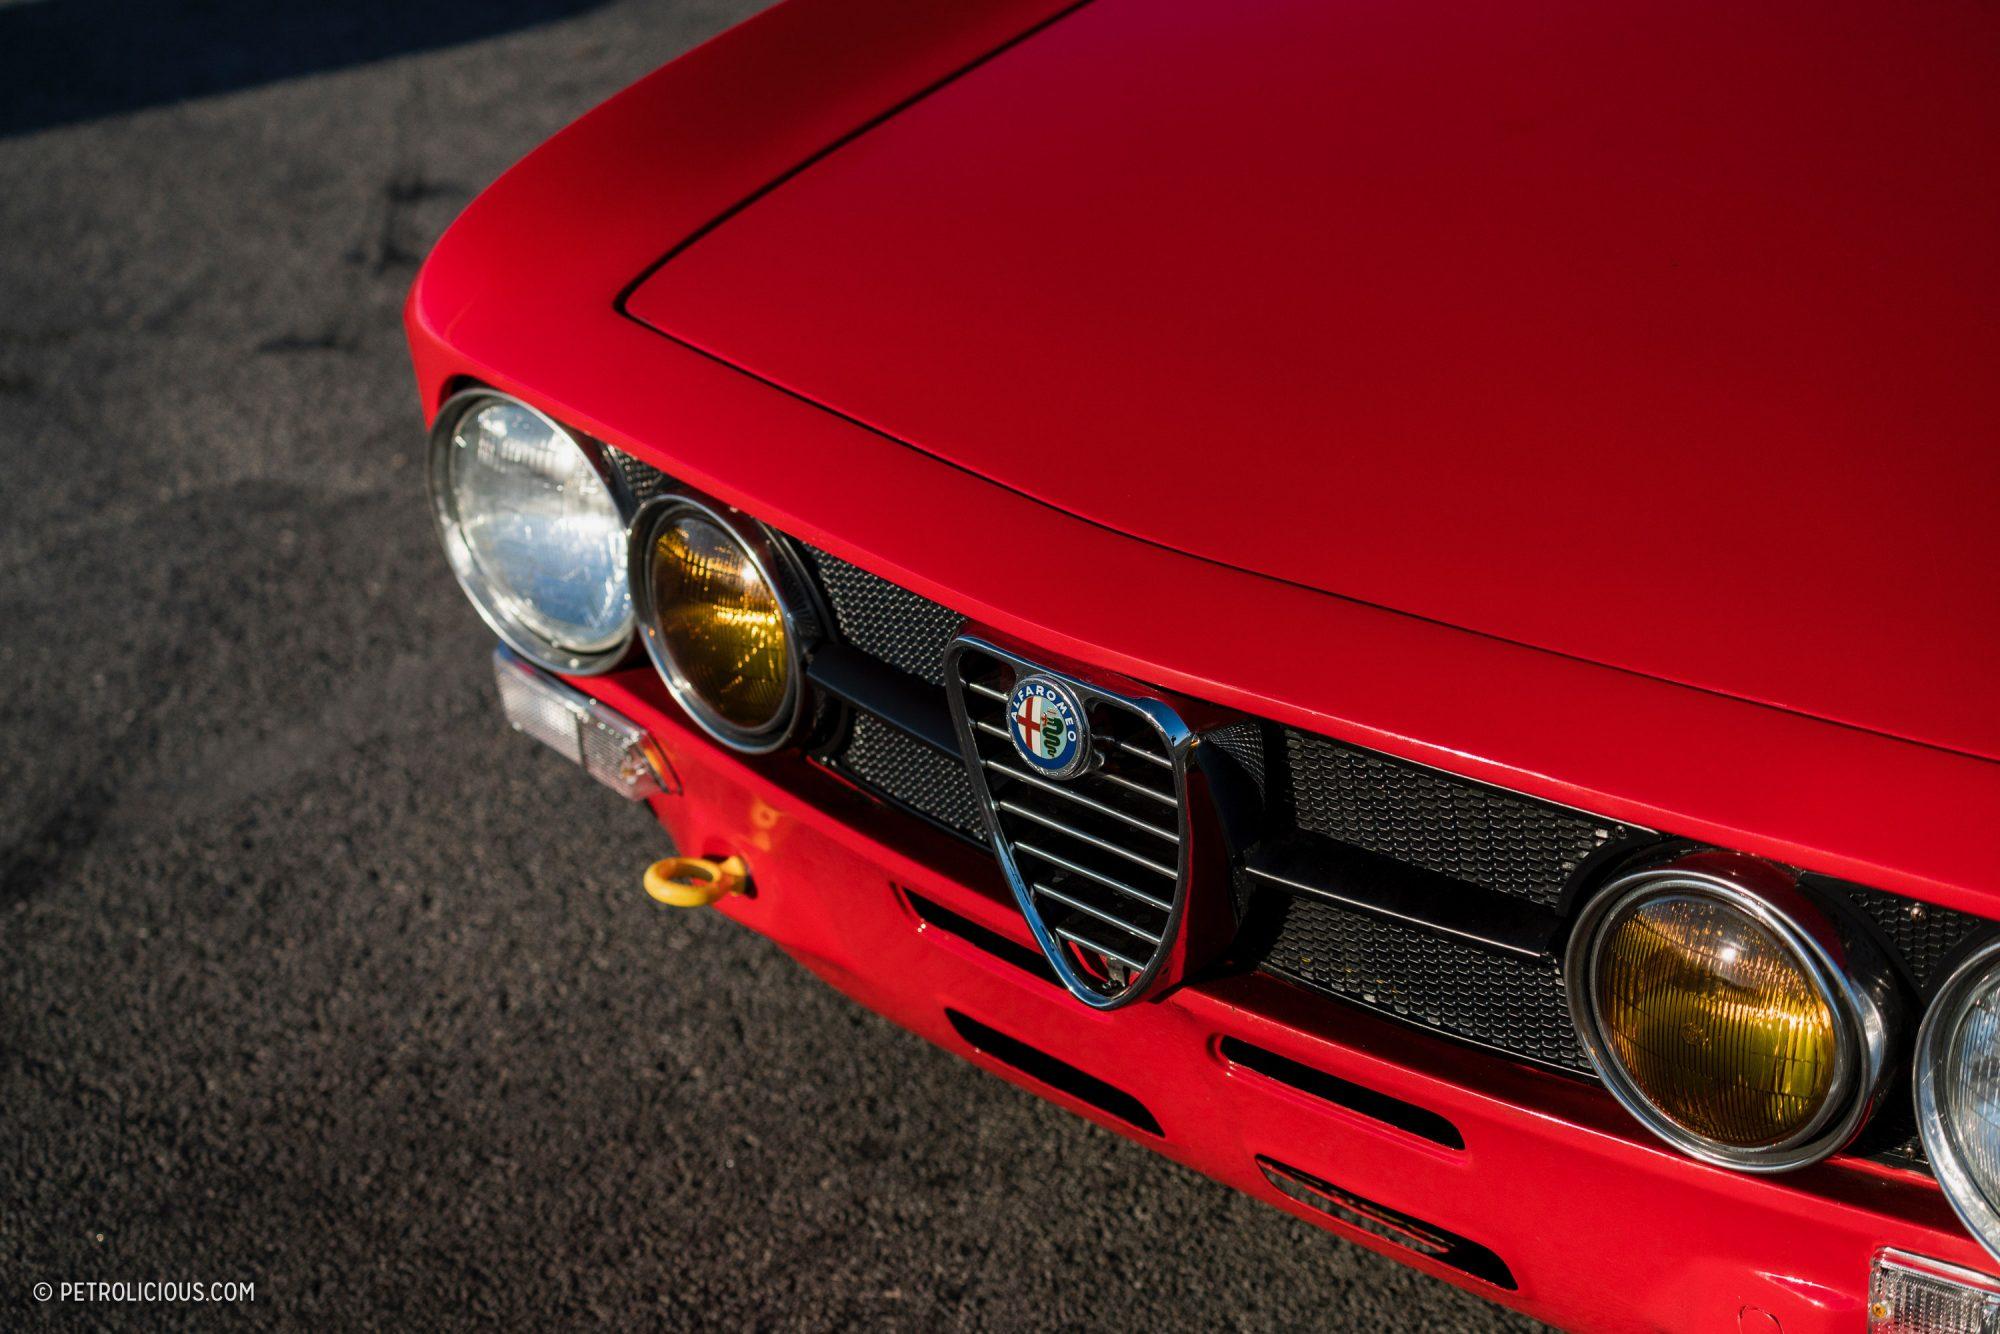 Alfa-Romeo-GTV-2000-film-gallery-10-2000x1334